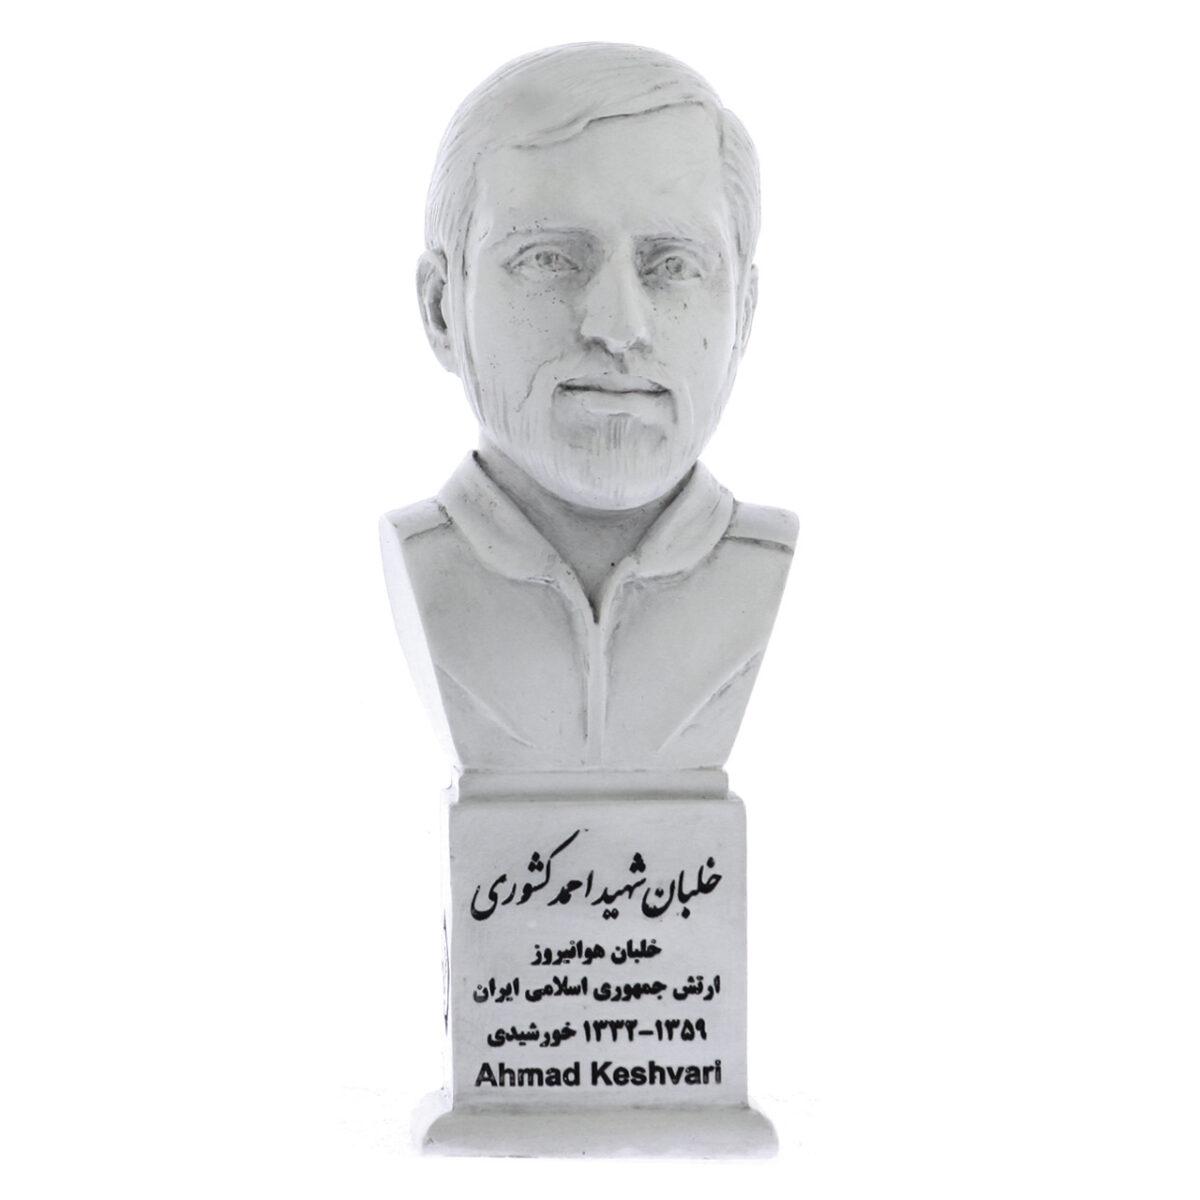 keshvari s 1200x1200 - سردیس خلبان شهید احمد کشوری